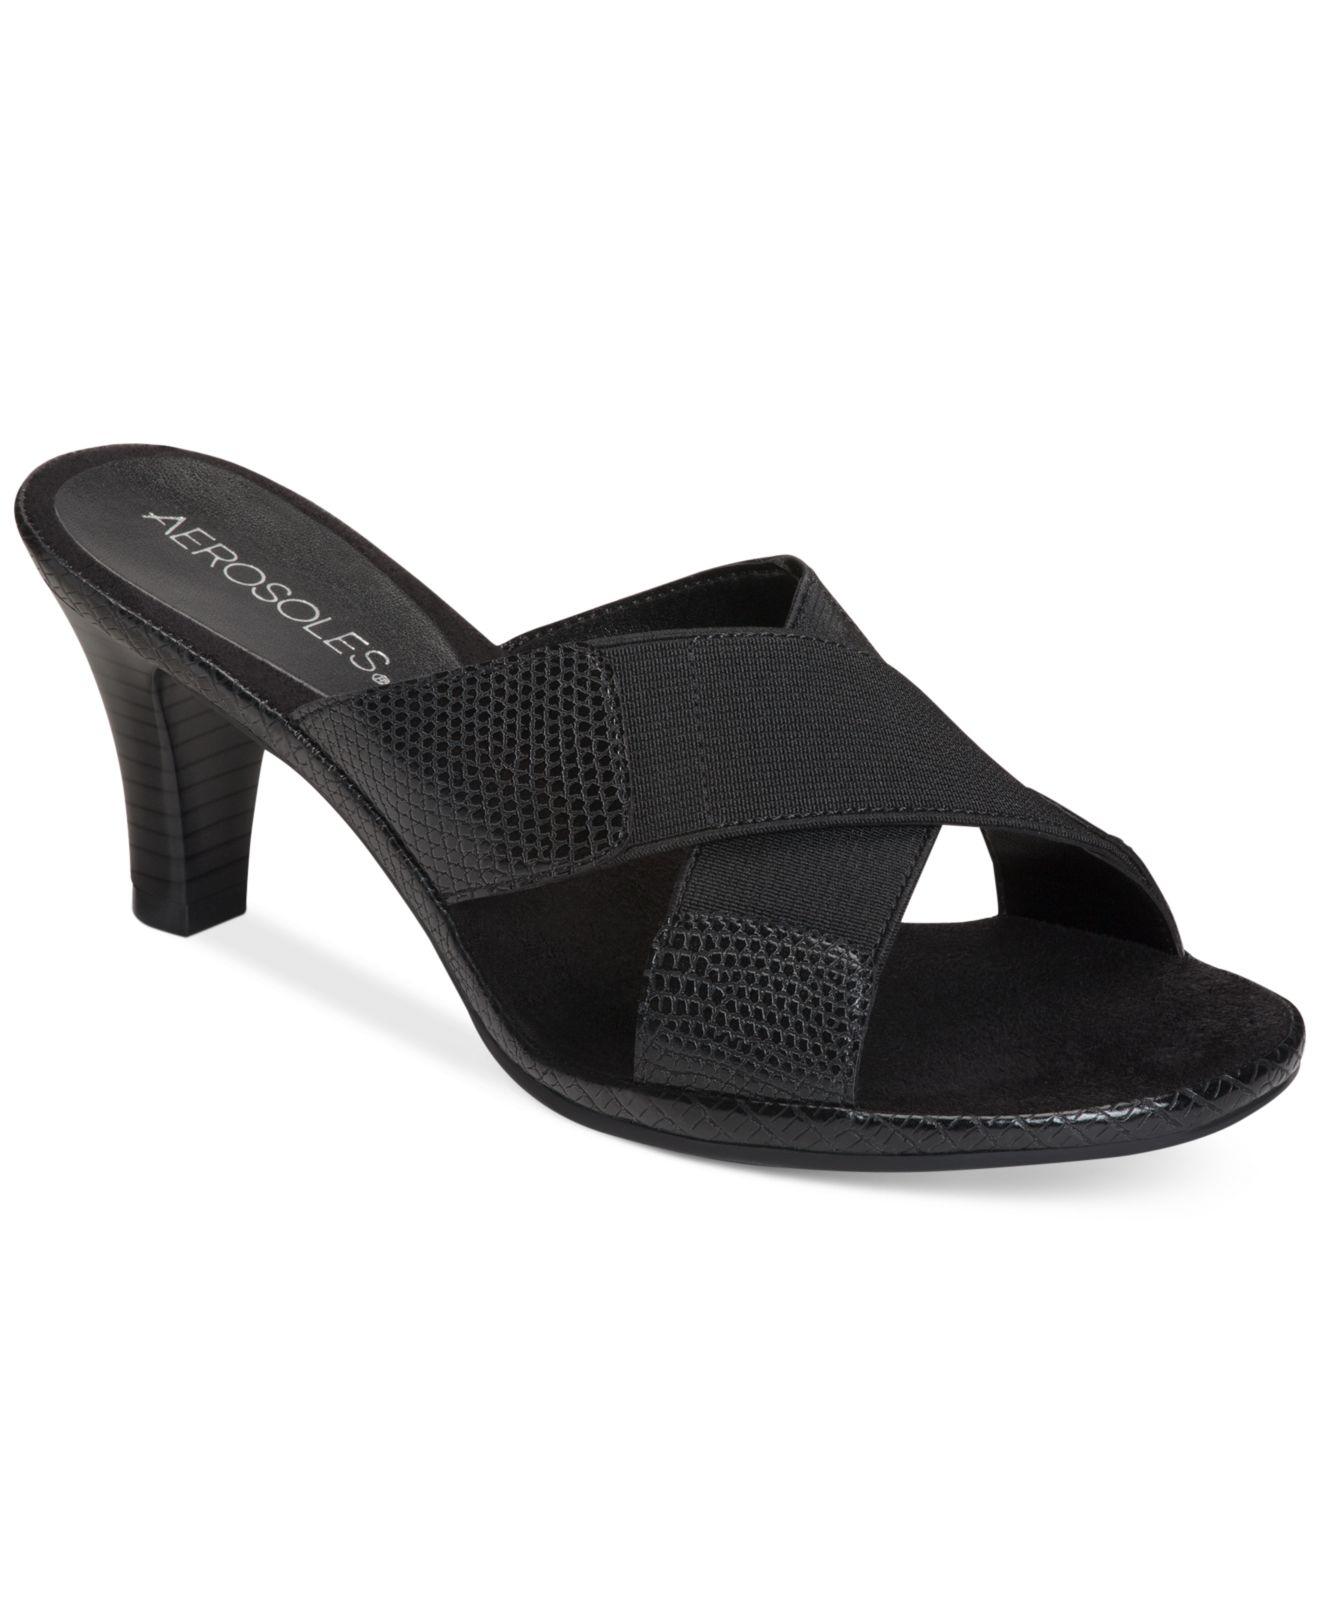 Aerosoles Love Powem Sandals In Black Save 48 Lyst